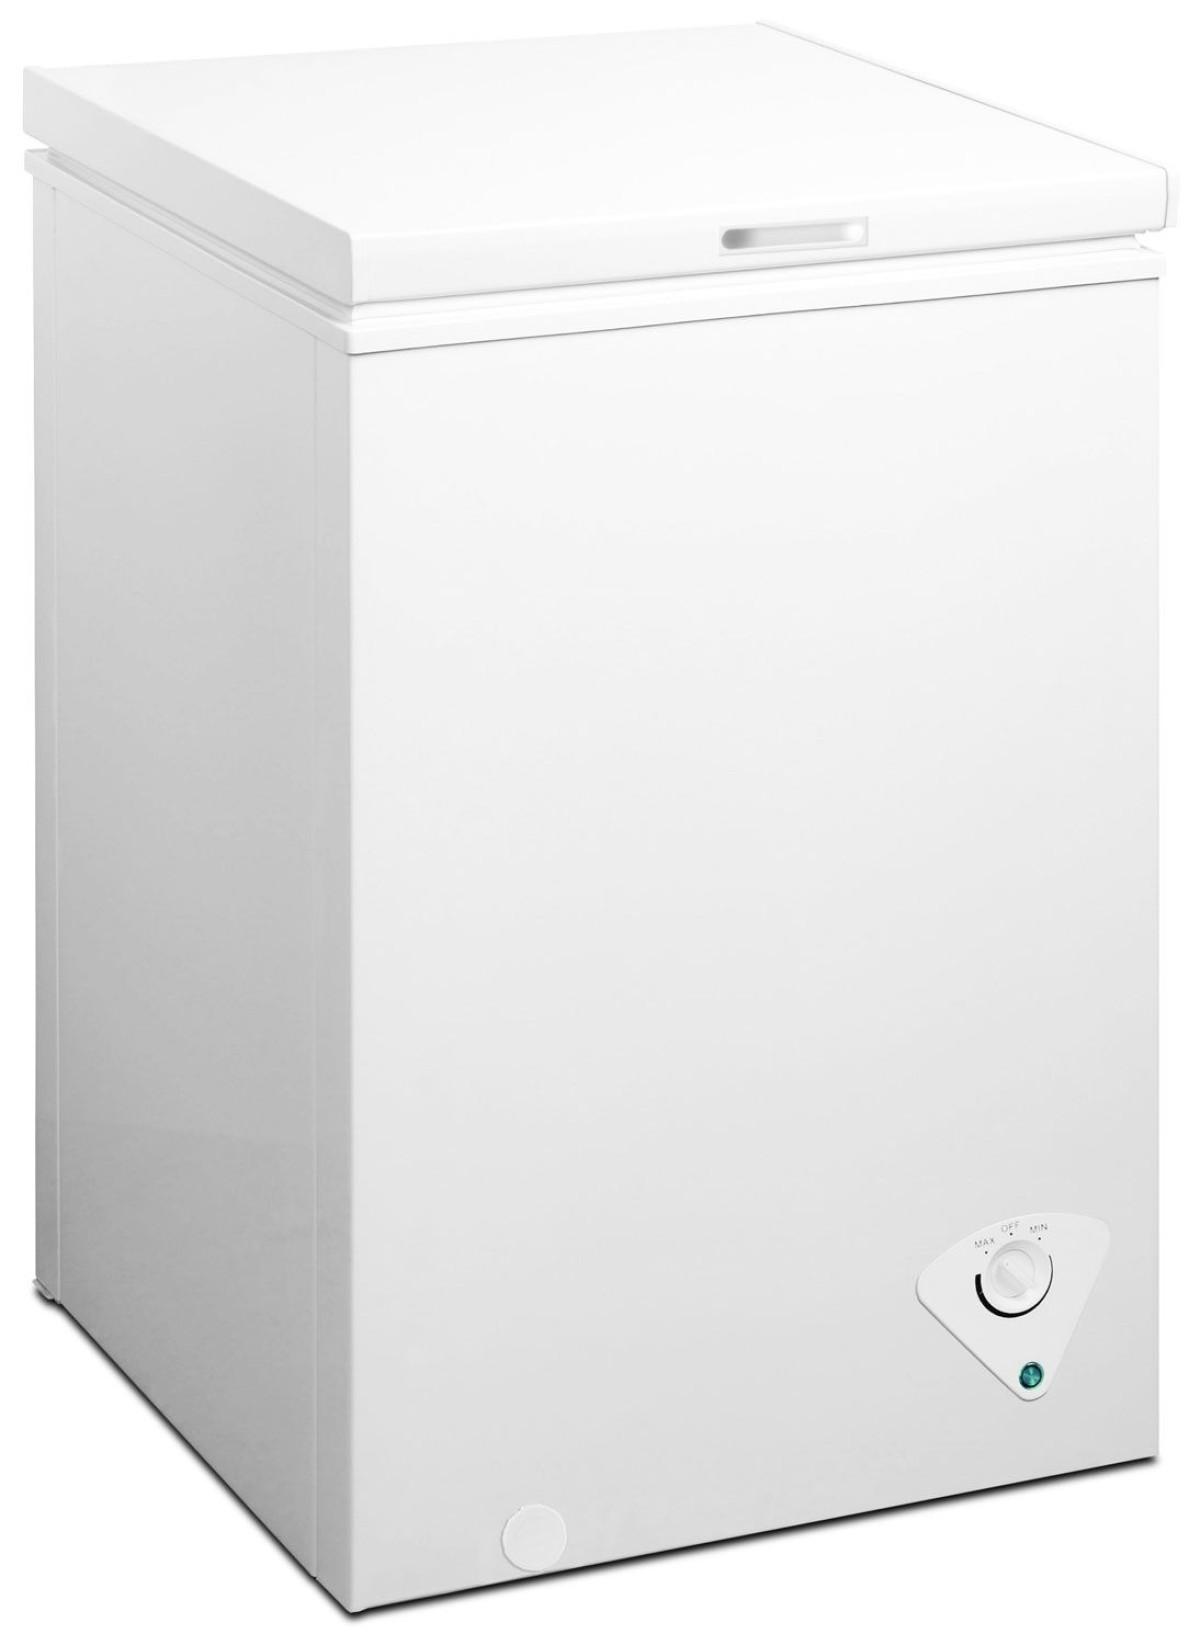 Midea 3 5 Cu Ft Chest Freezer White Freedom Rent To Own